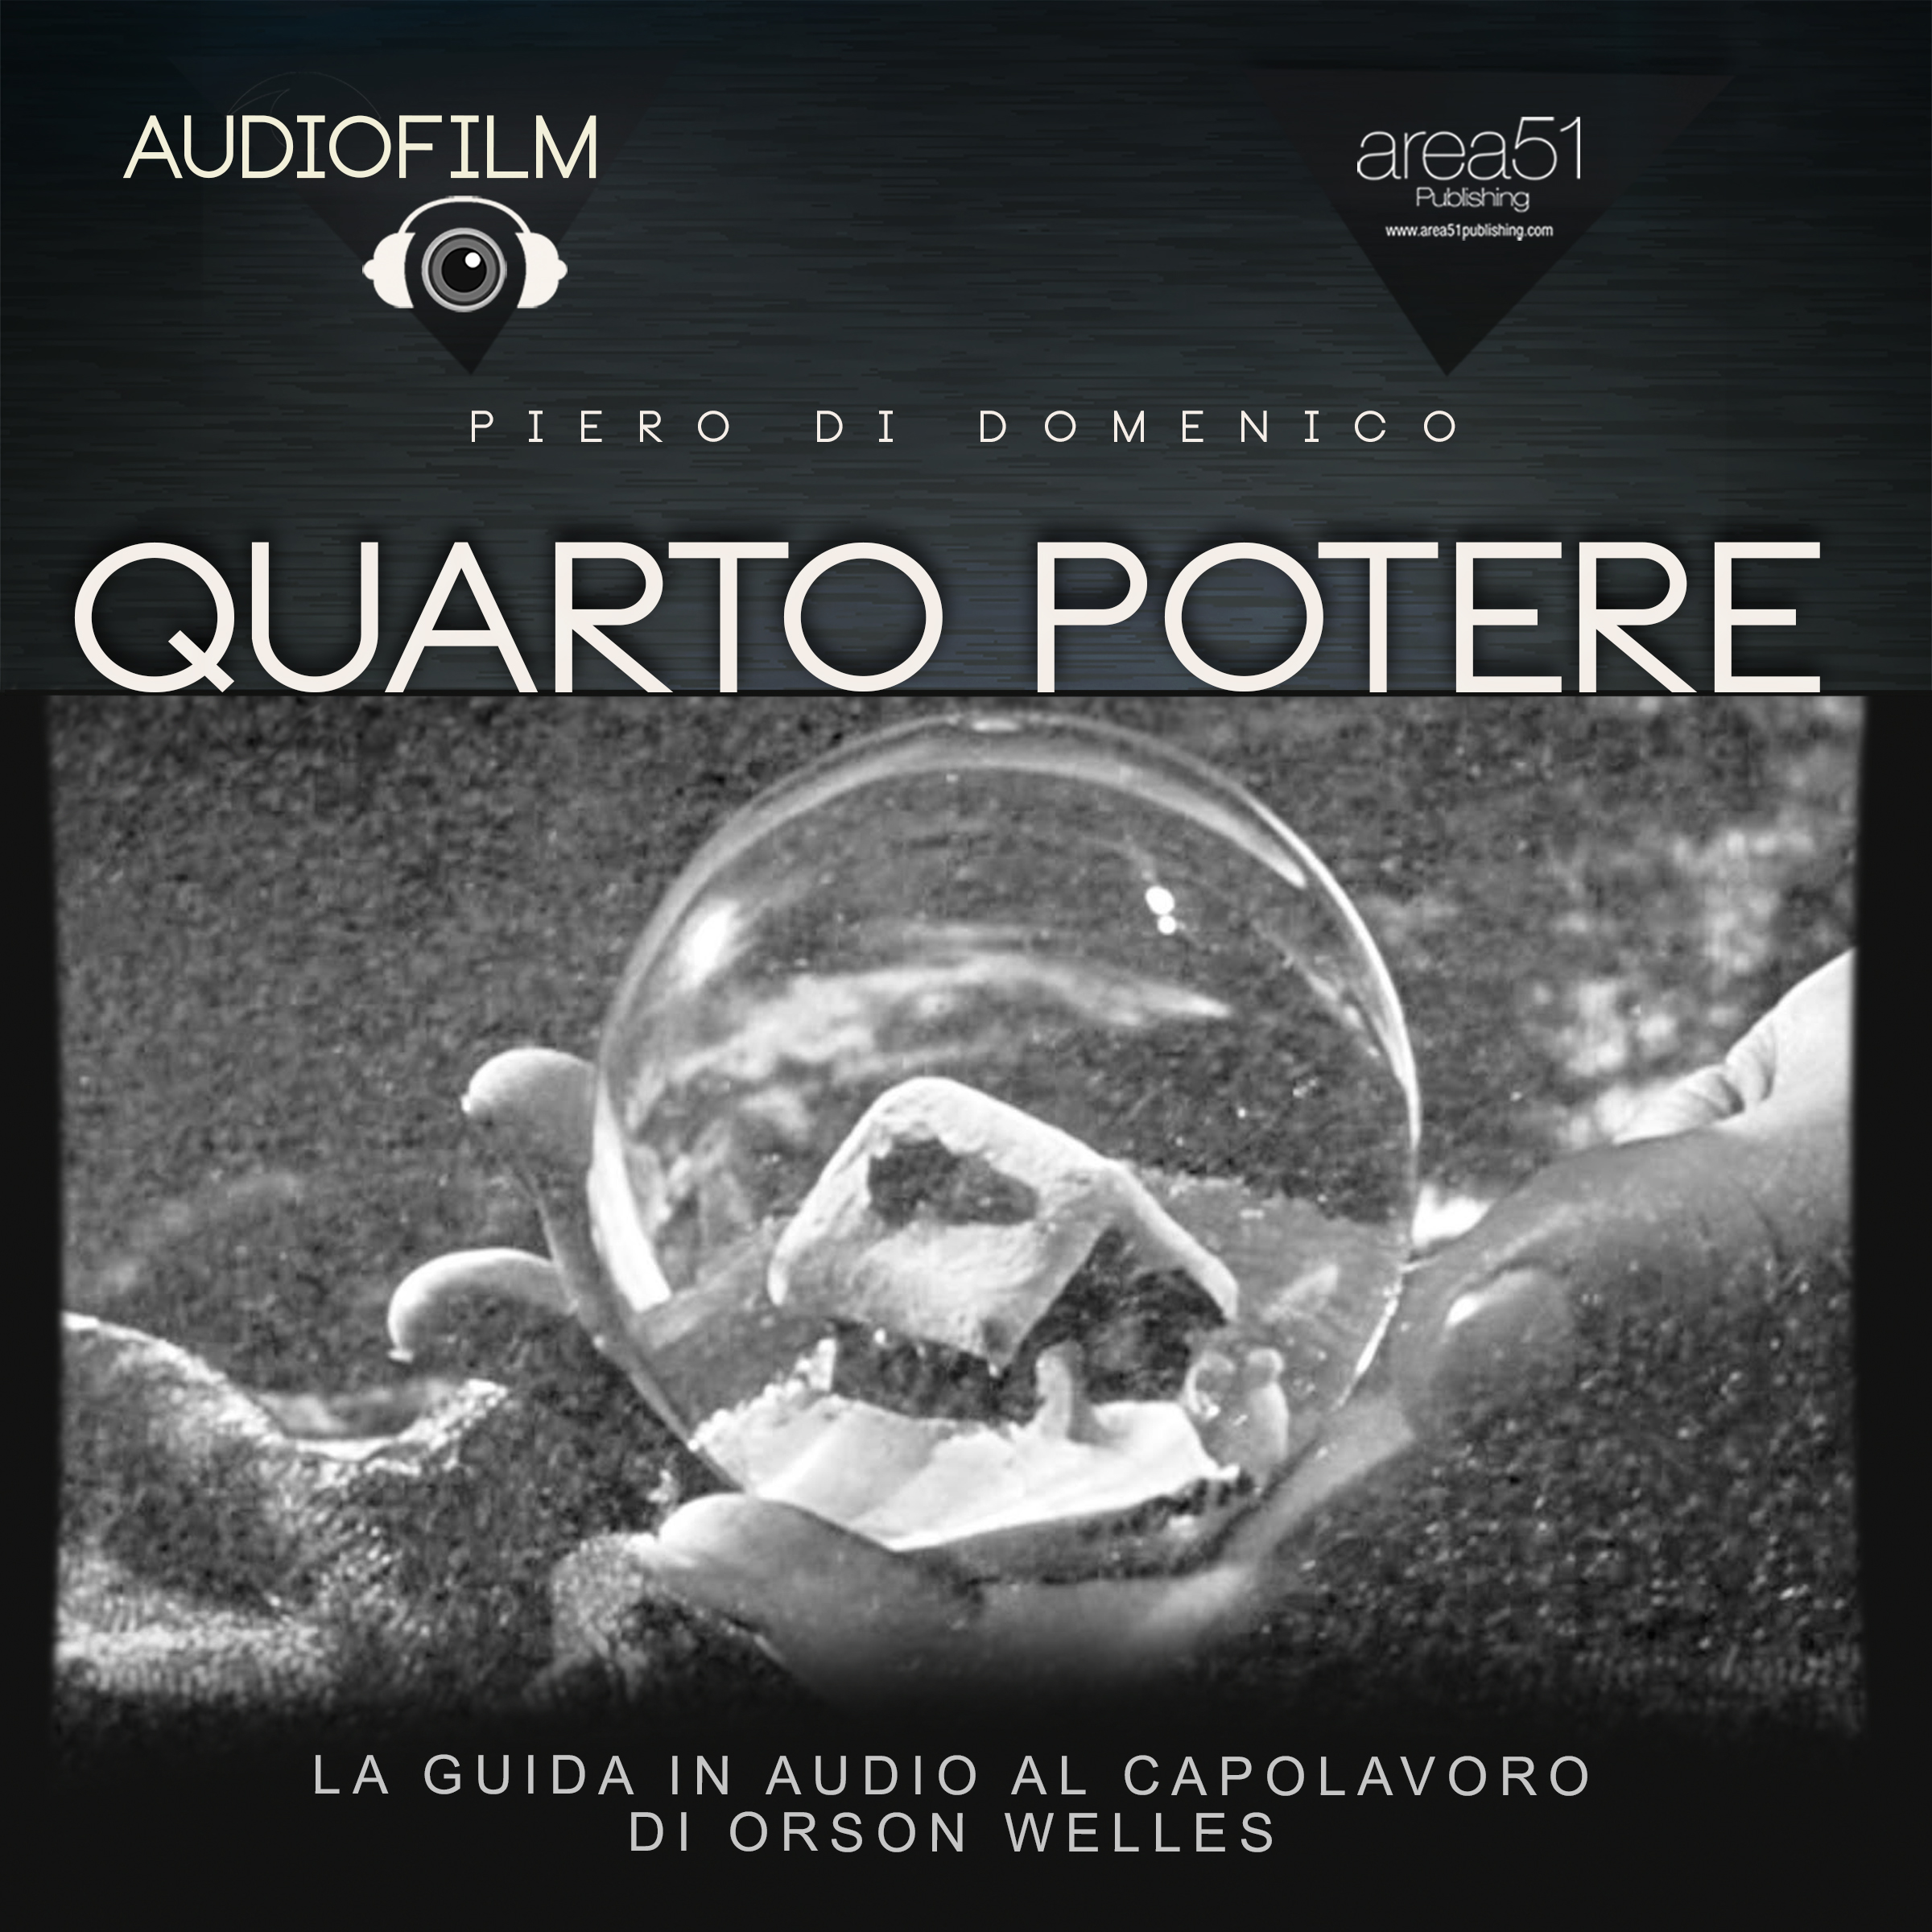 Quarto Potere. Audiofilm-0